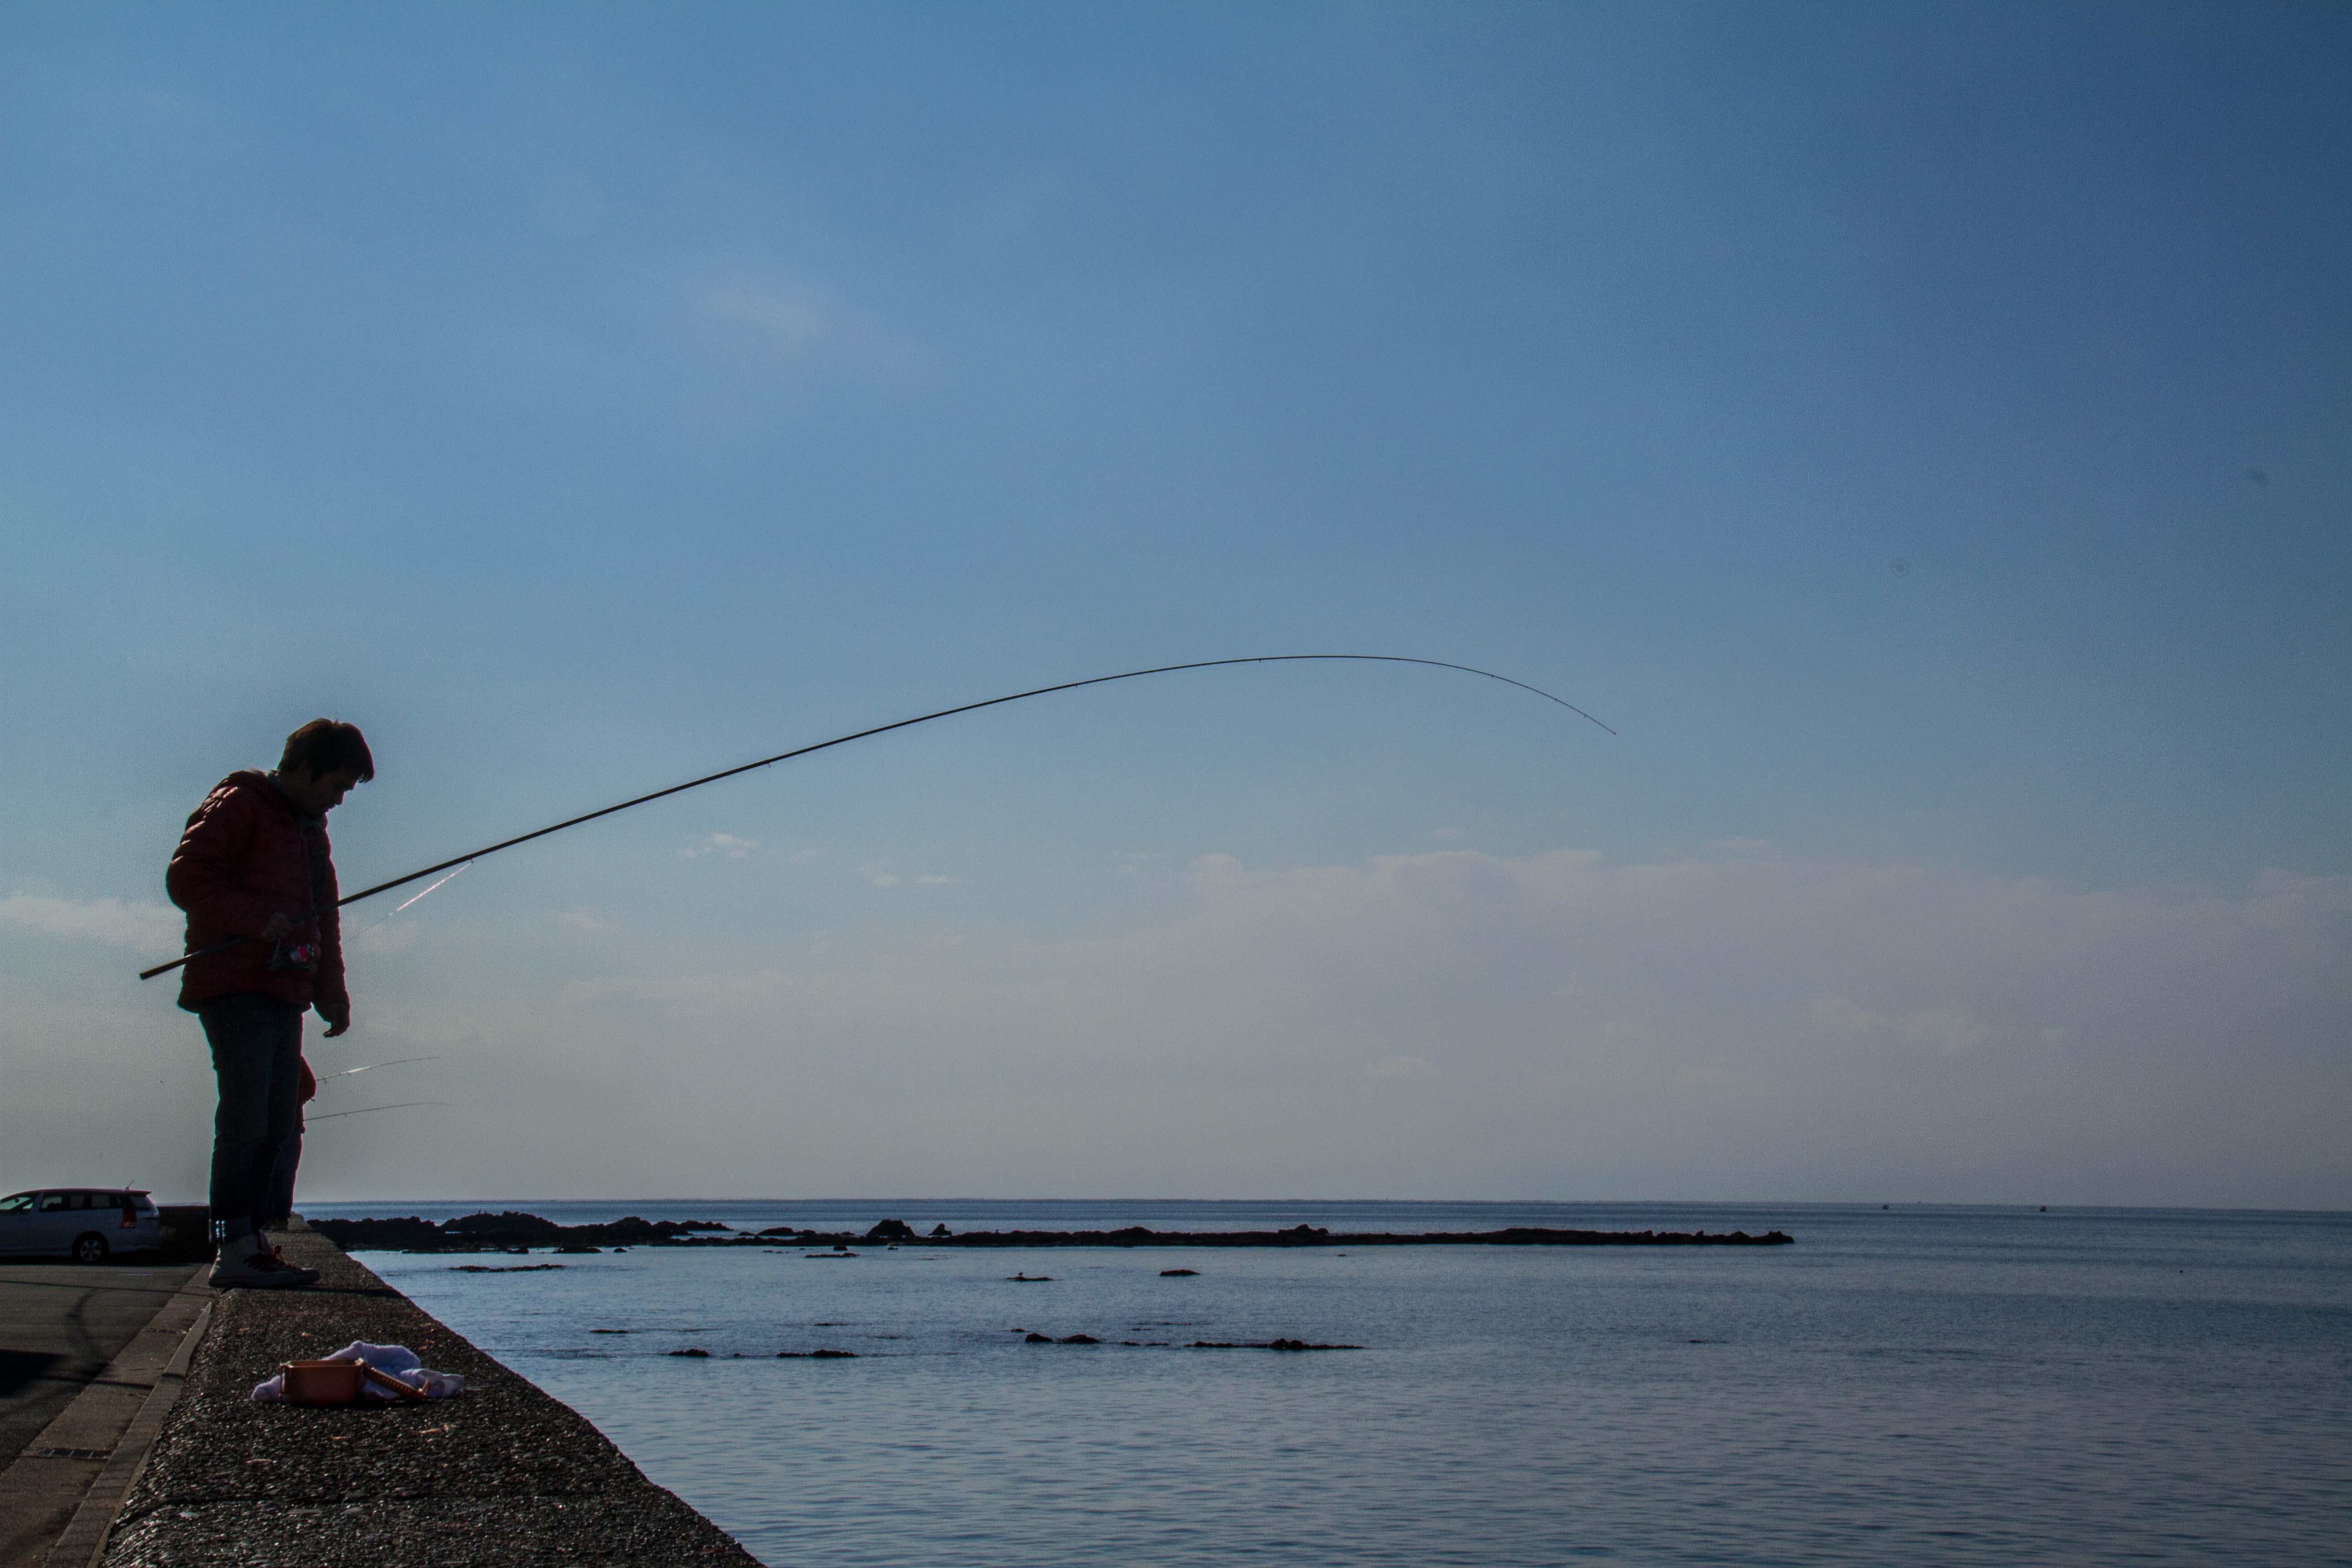 Fisherman (1 of 1)